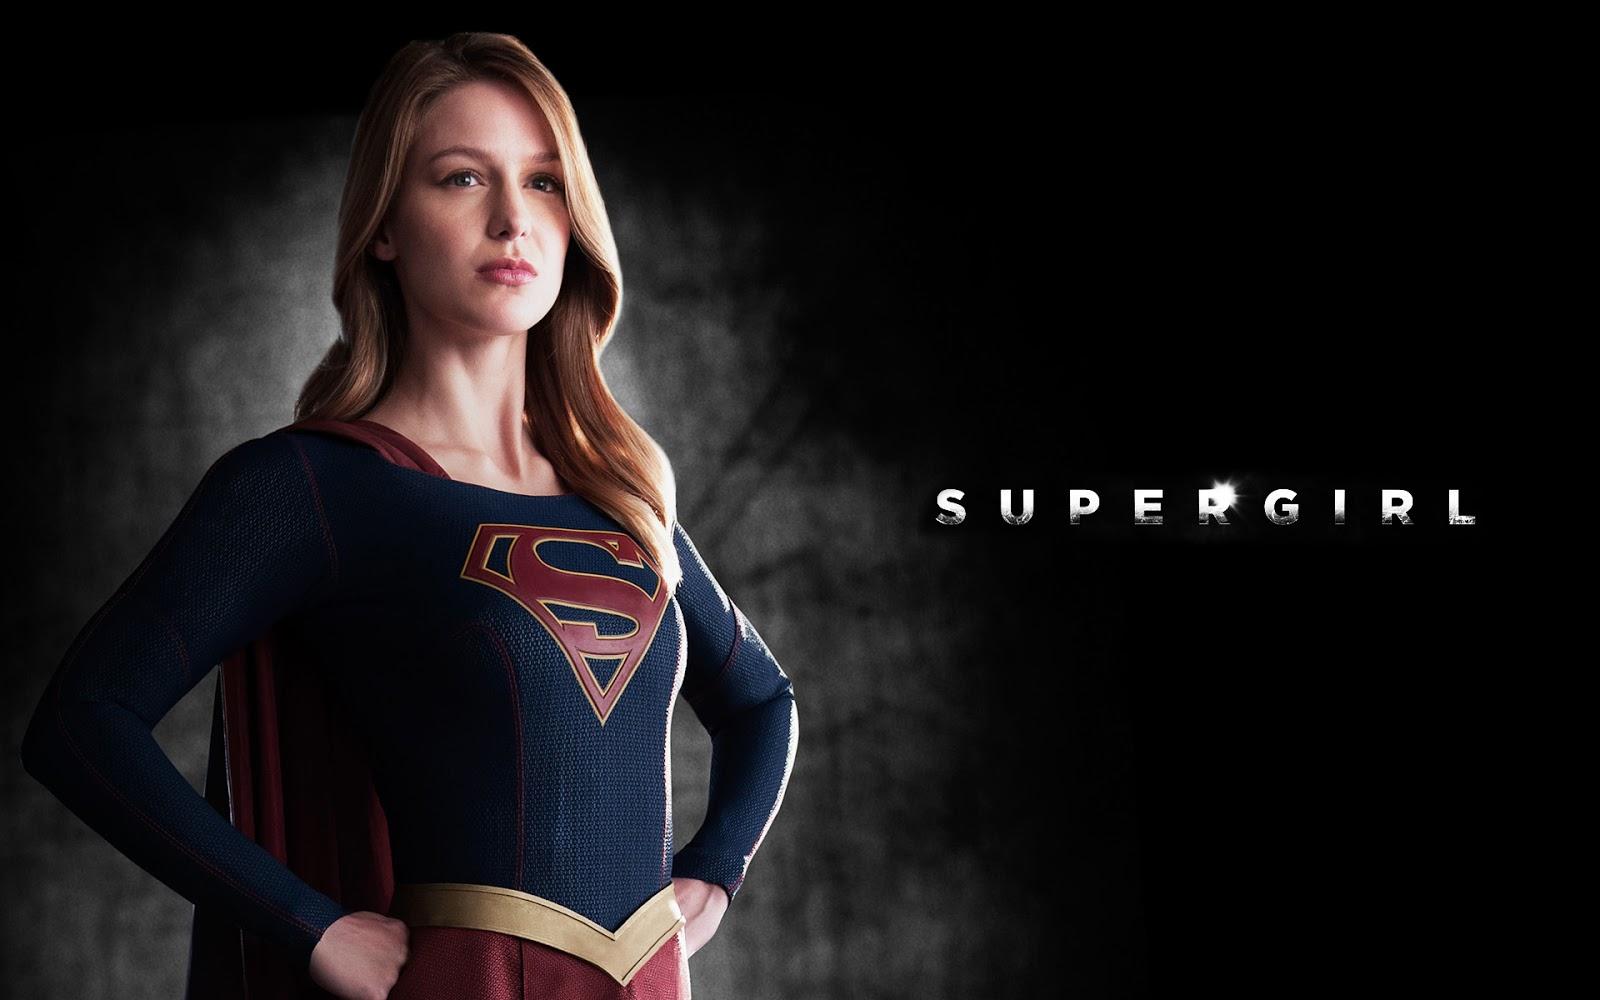 Supergirl TV Show Wallpaper